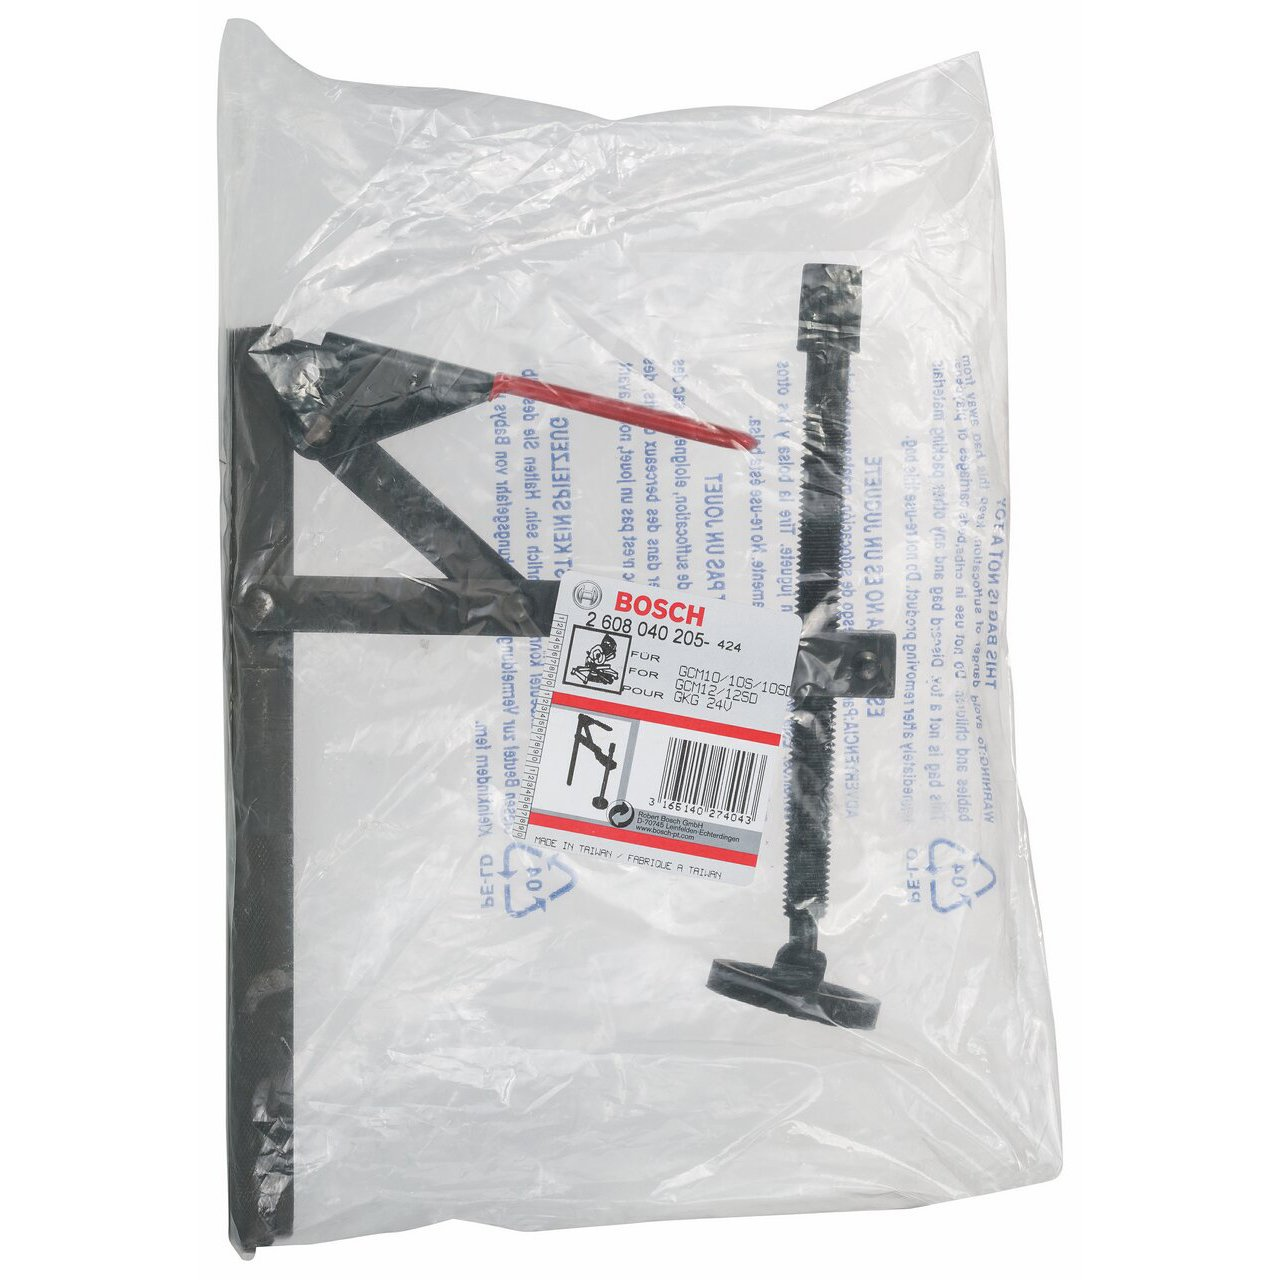 Bosch 2608040205 Levier de serrage rapide vertical